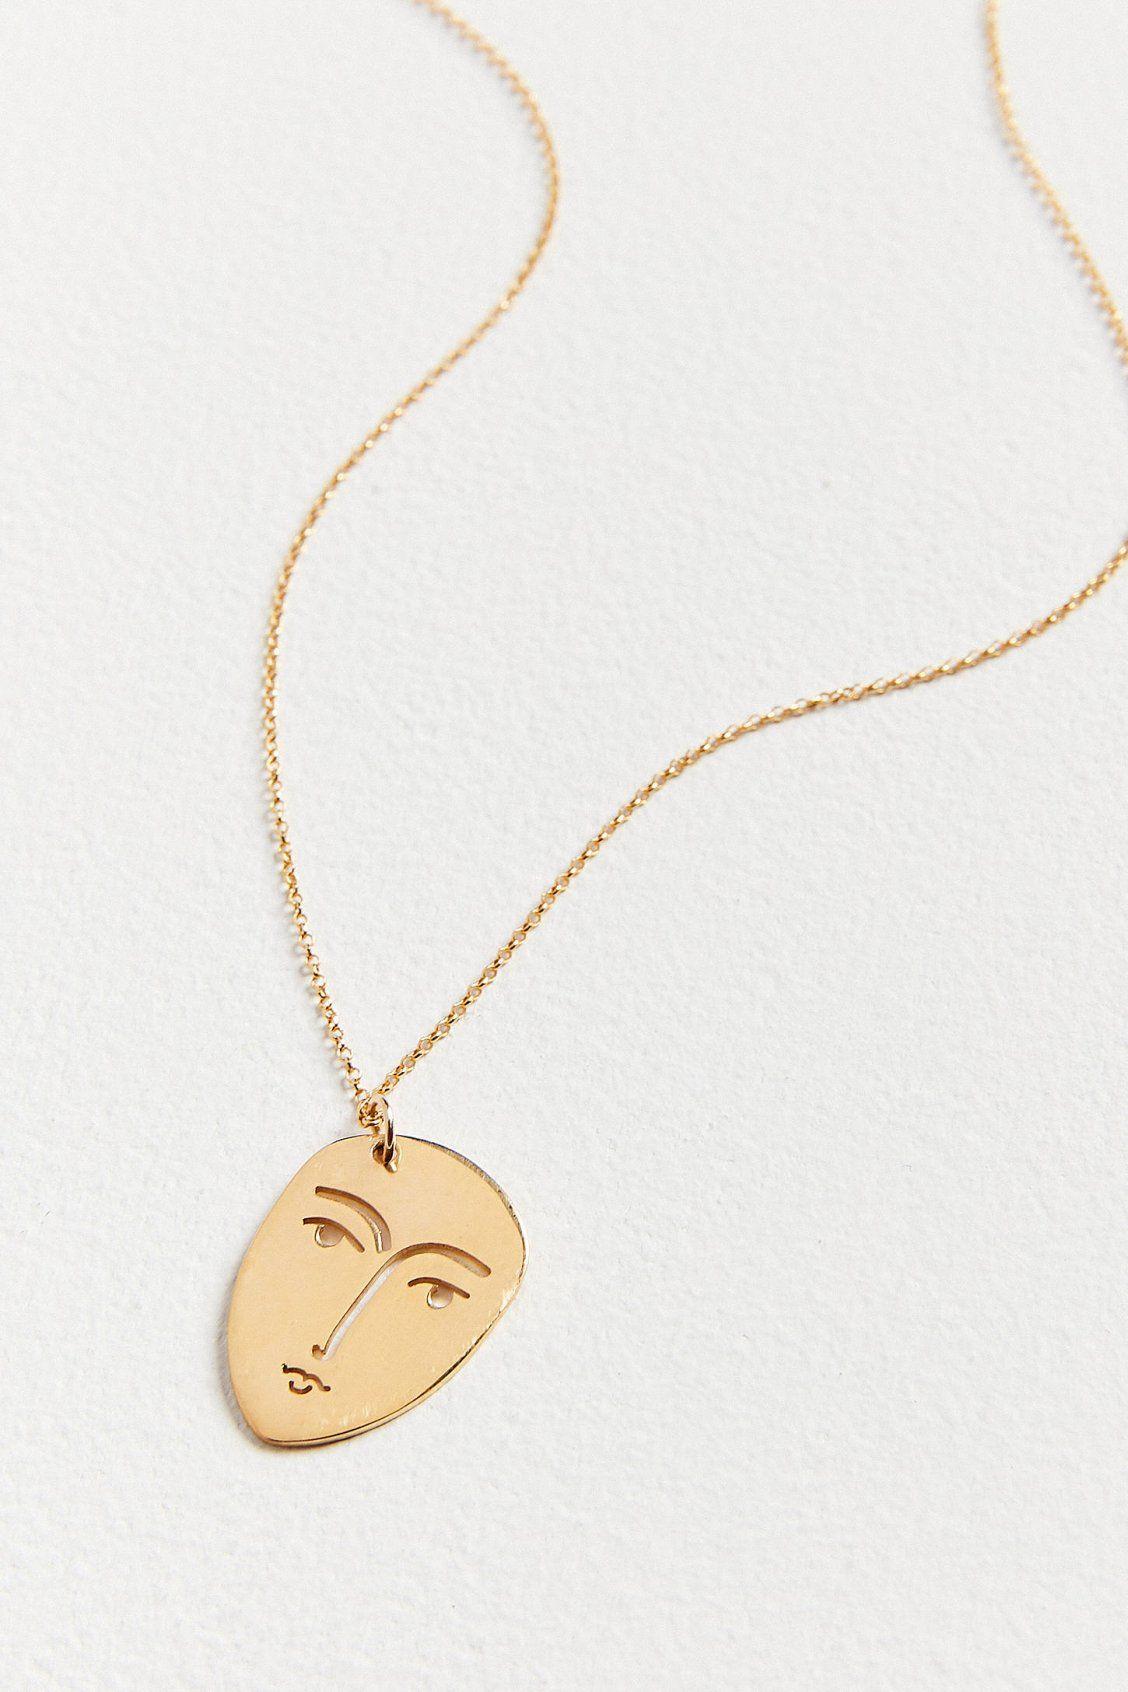 Face Pendant Kopi face pendant necklace urban outfitters urban and pendants kopi face pendant necklace urban outfitters audiocablefo